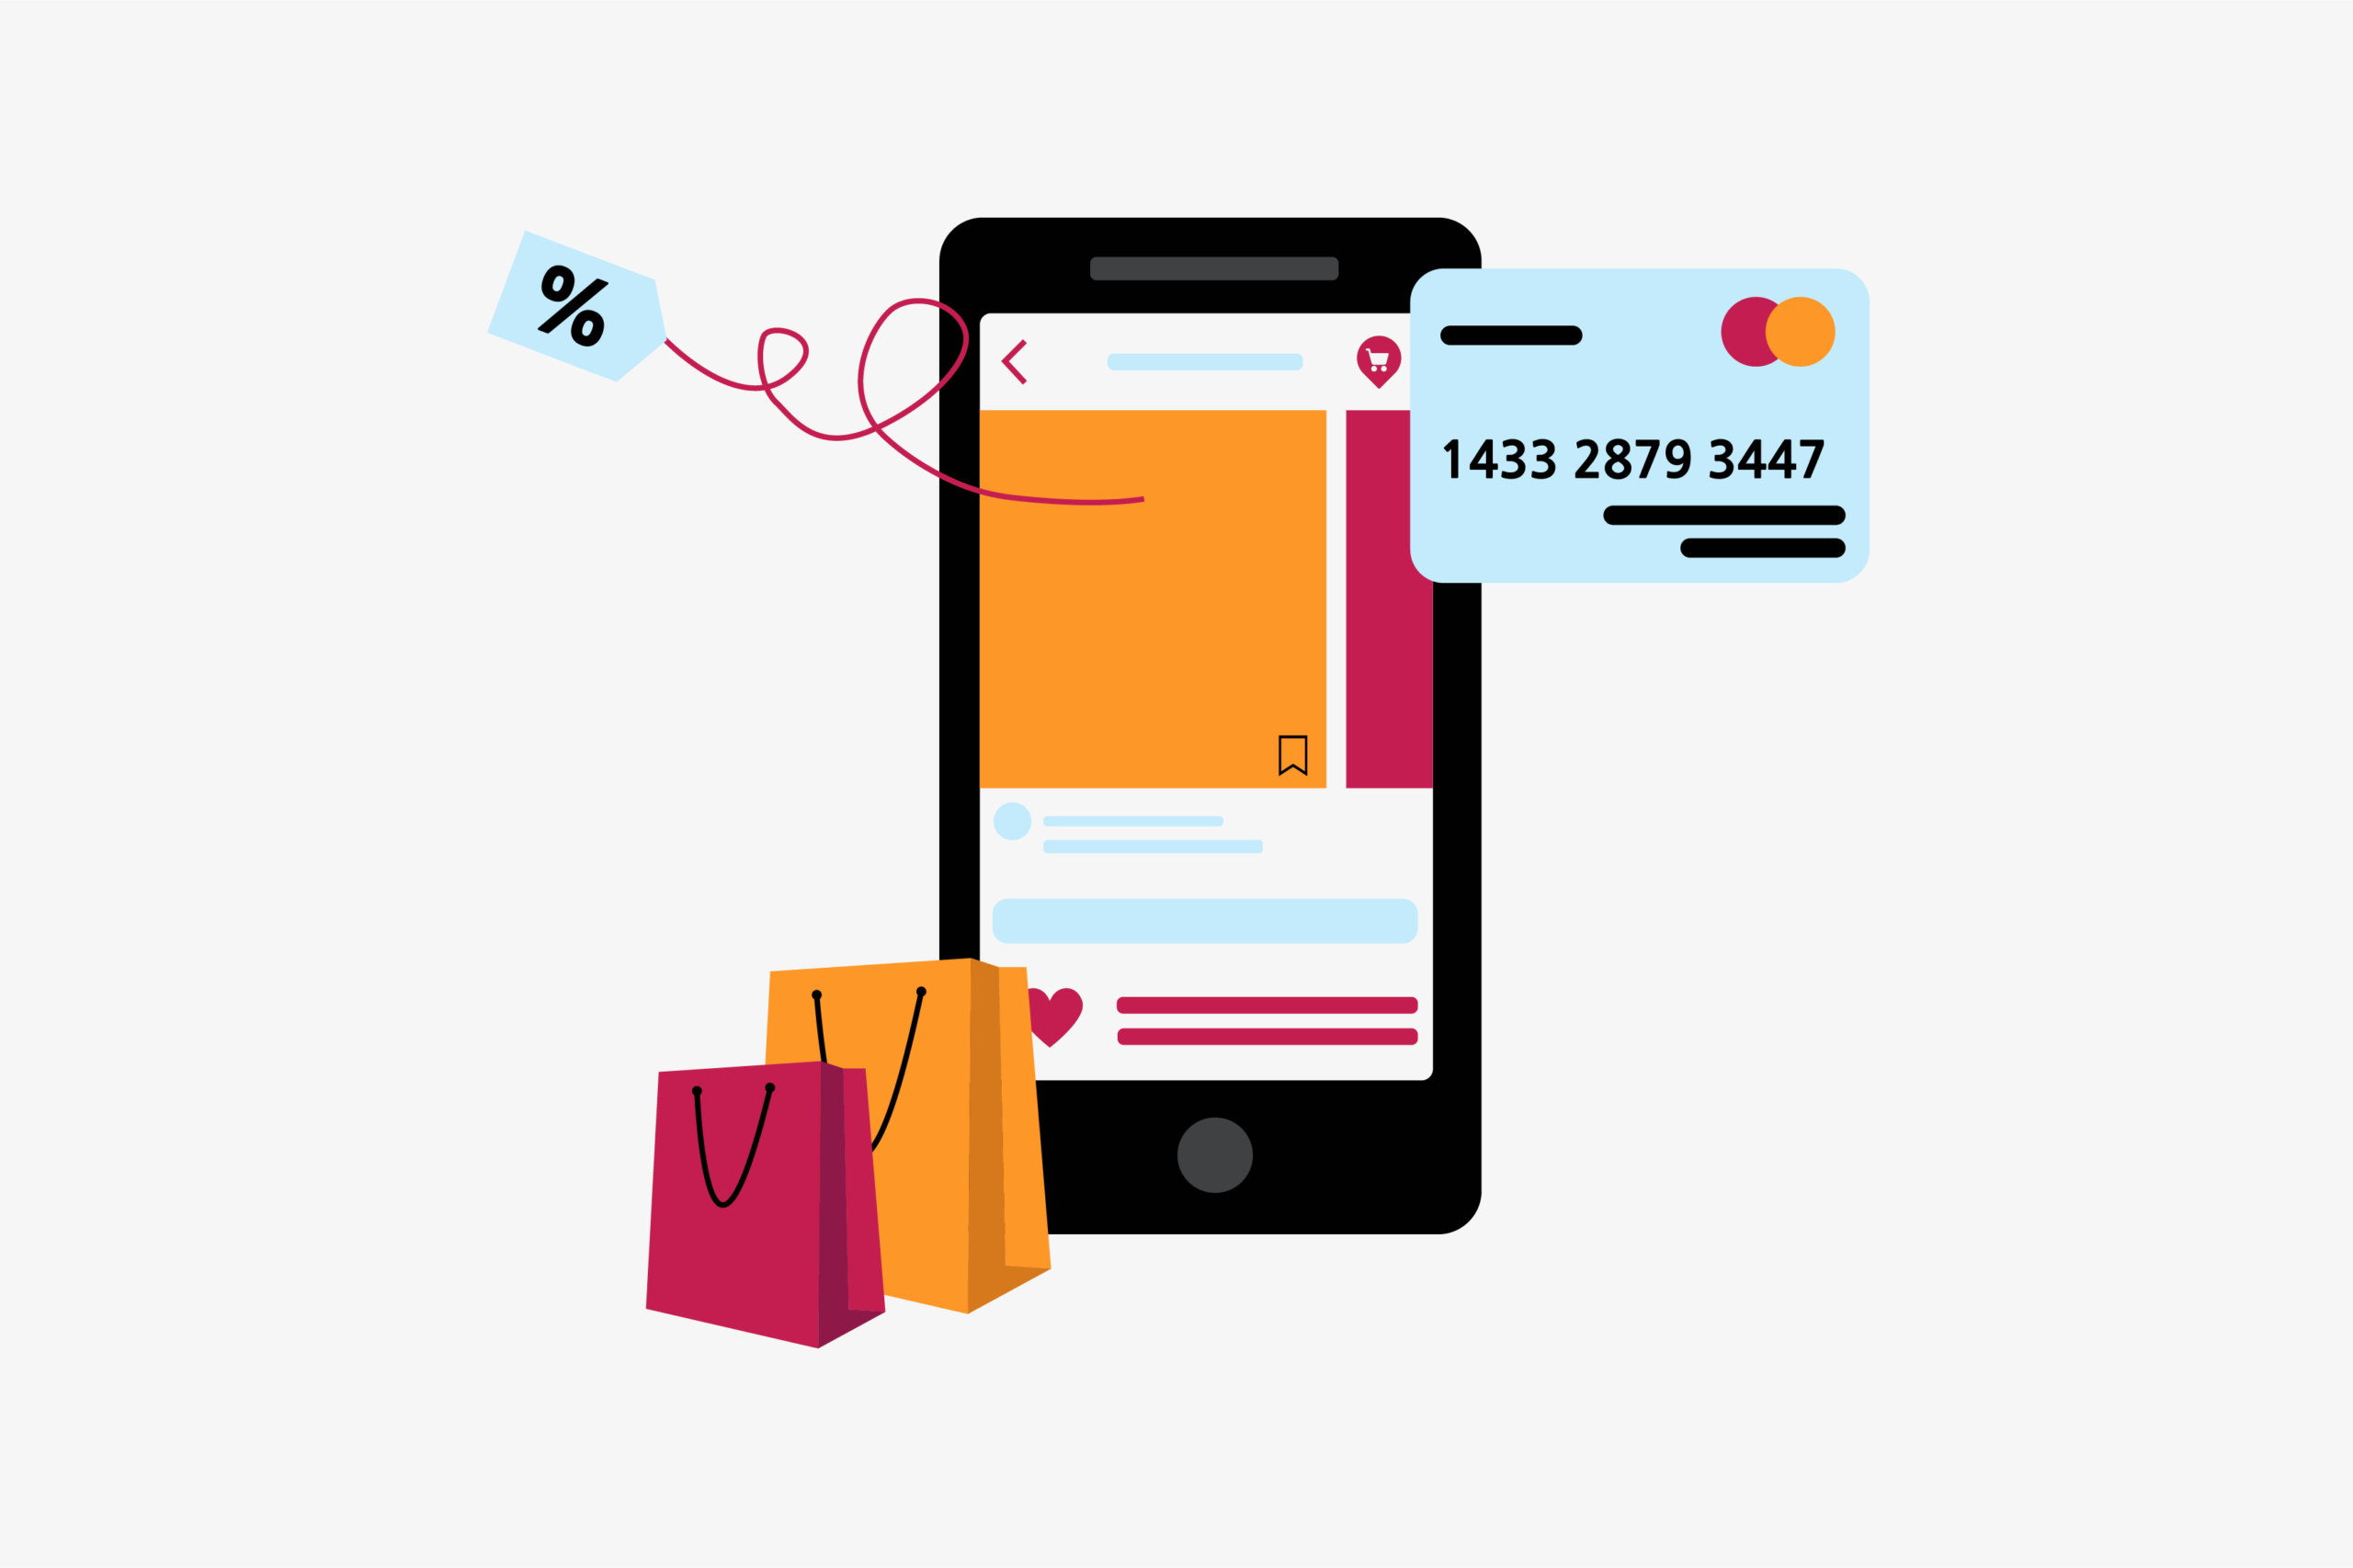 Generating sales via social media